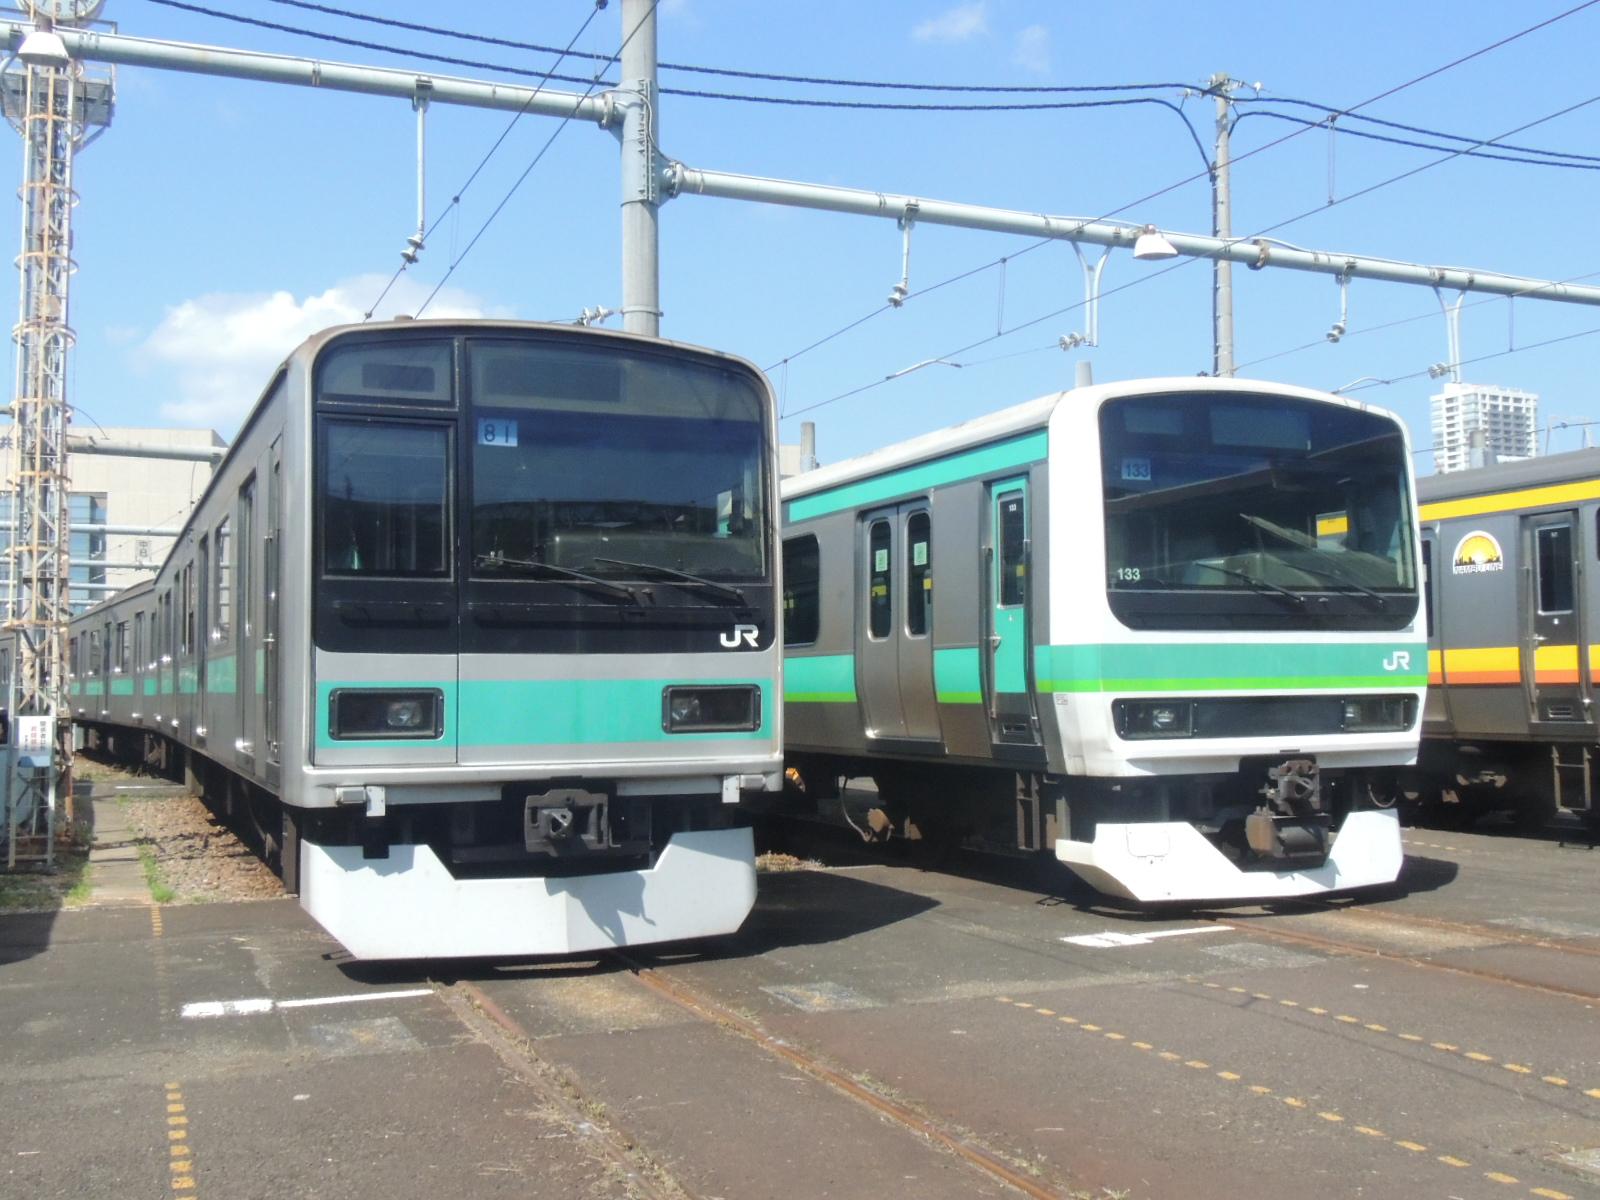 TK2015年一般公開 E231系緑電と209系マト81並び (4)